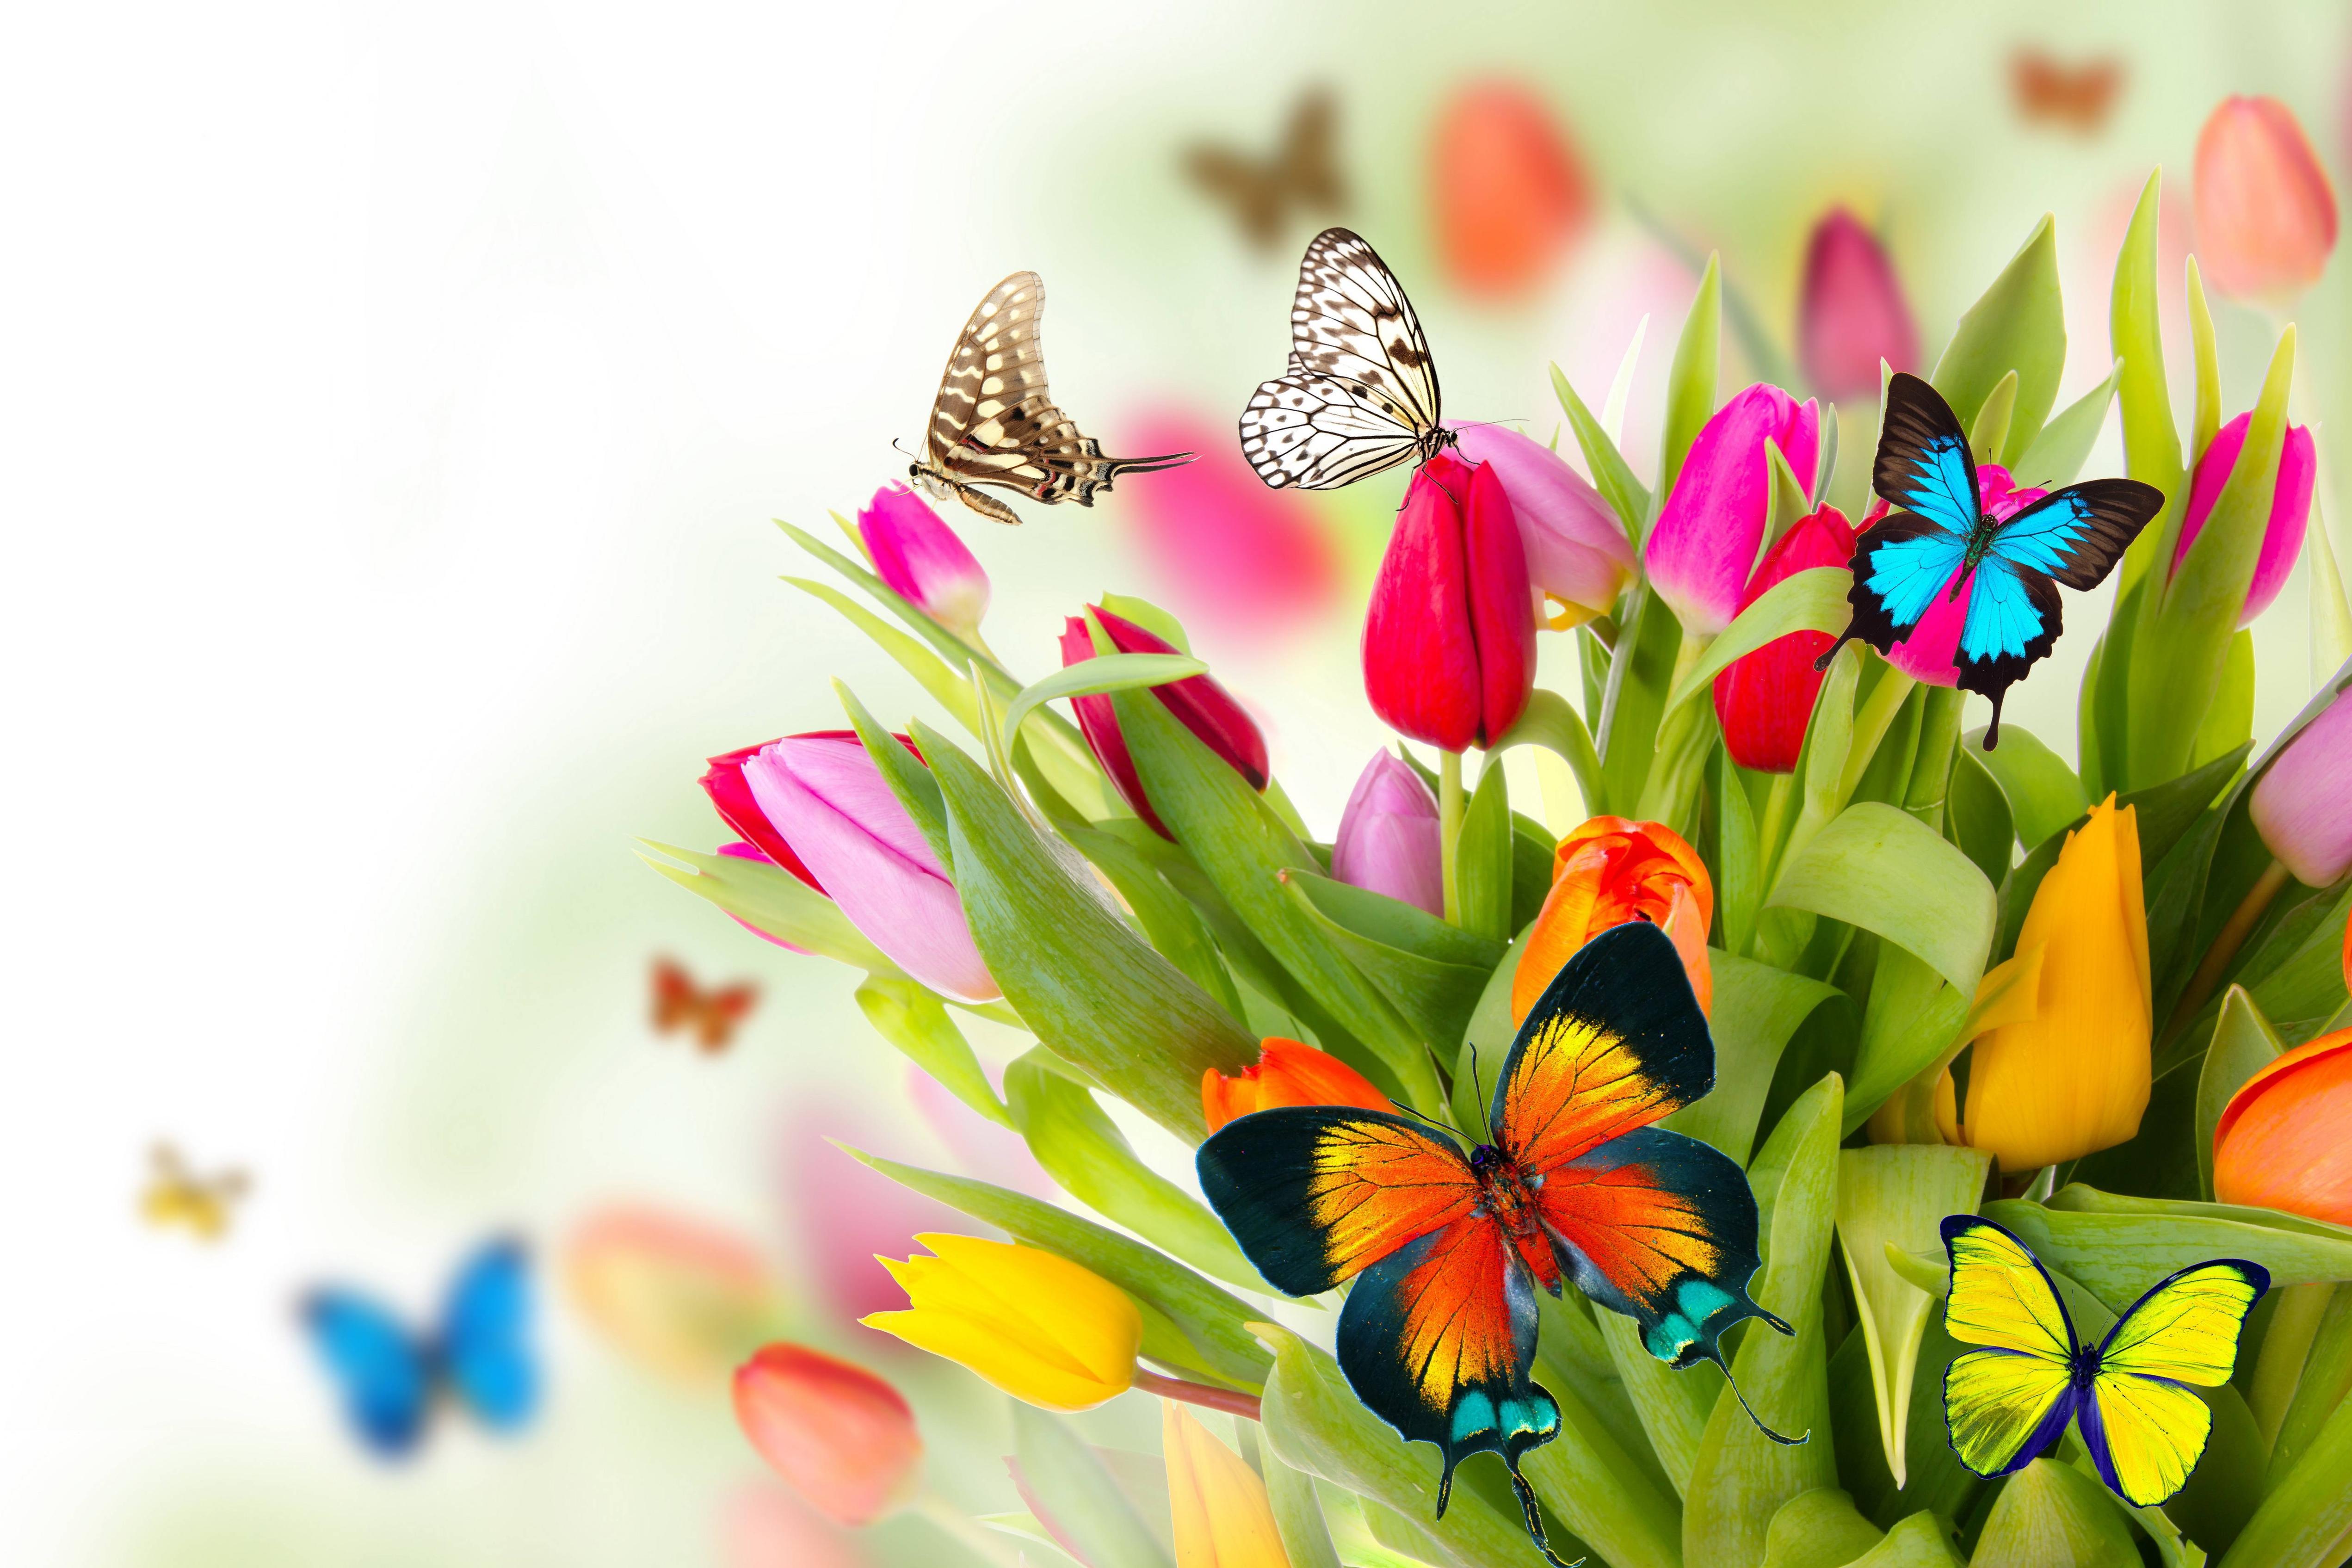 Spring flowers wallpapers desktop flowers healthy spring flowers backgrounds desktop wallpaper cave mightylinksfo